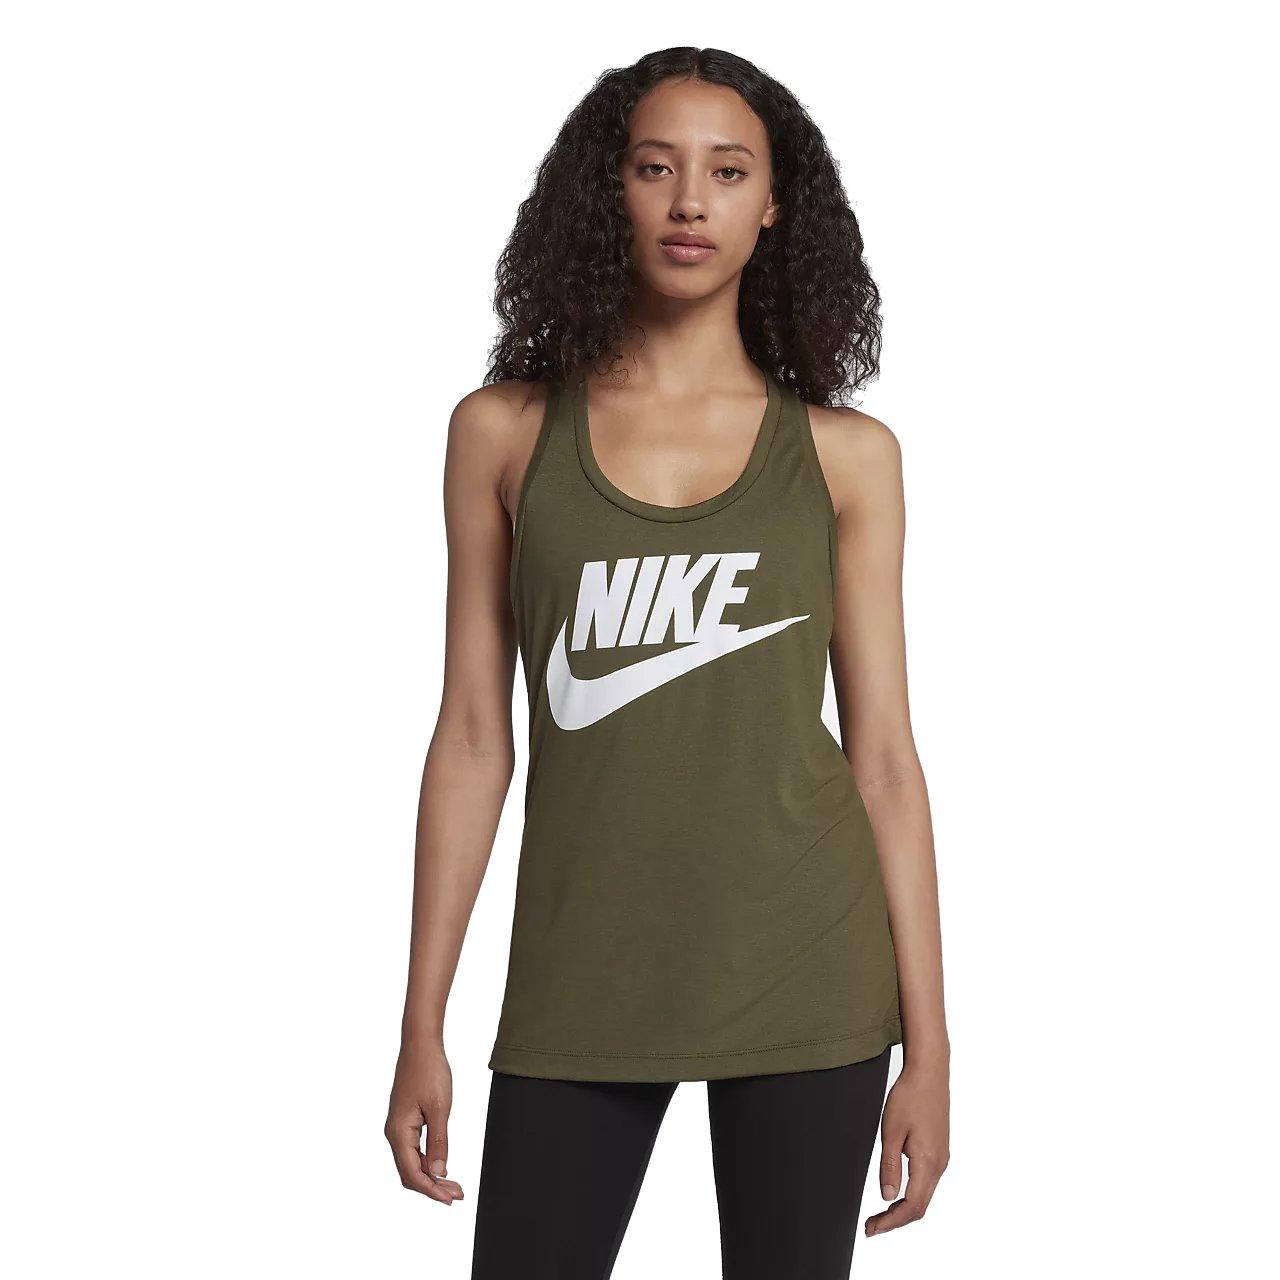 Nike Essential Hbr Camiseta de Tirantes, Mujer